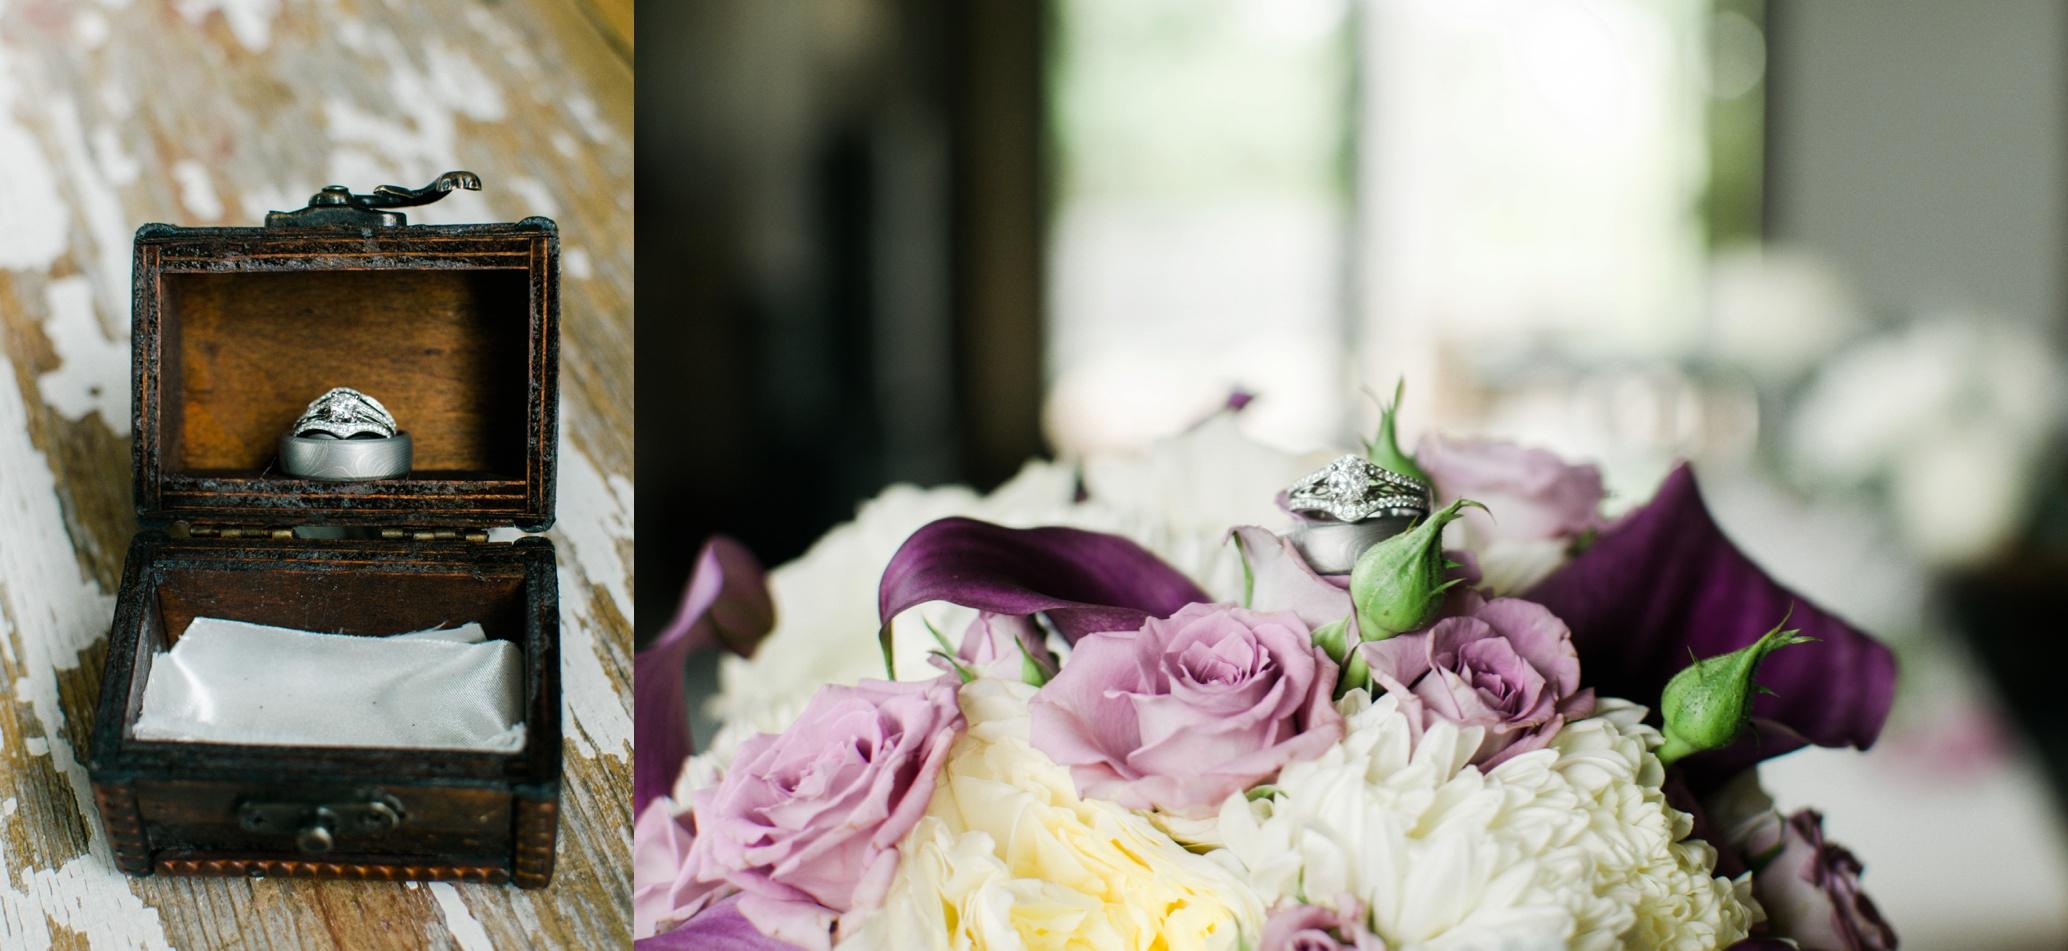 Barnes' Place Adel, IA Rustic Wedding | Ali Leigh Photo Minneapolis Wedding Photographer